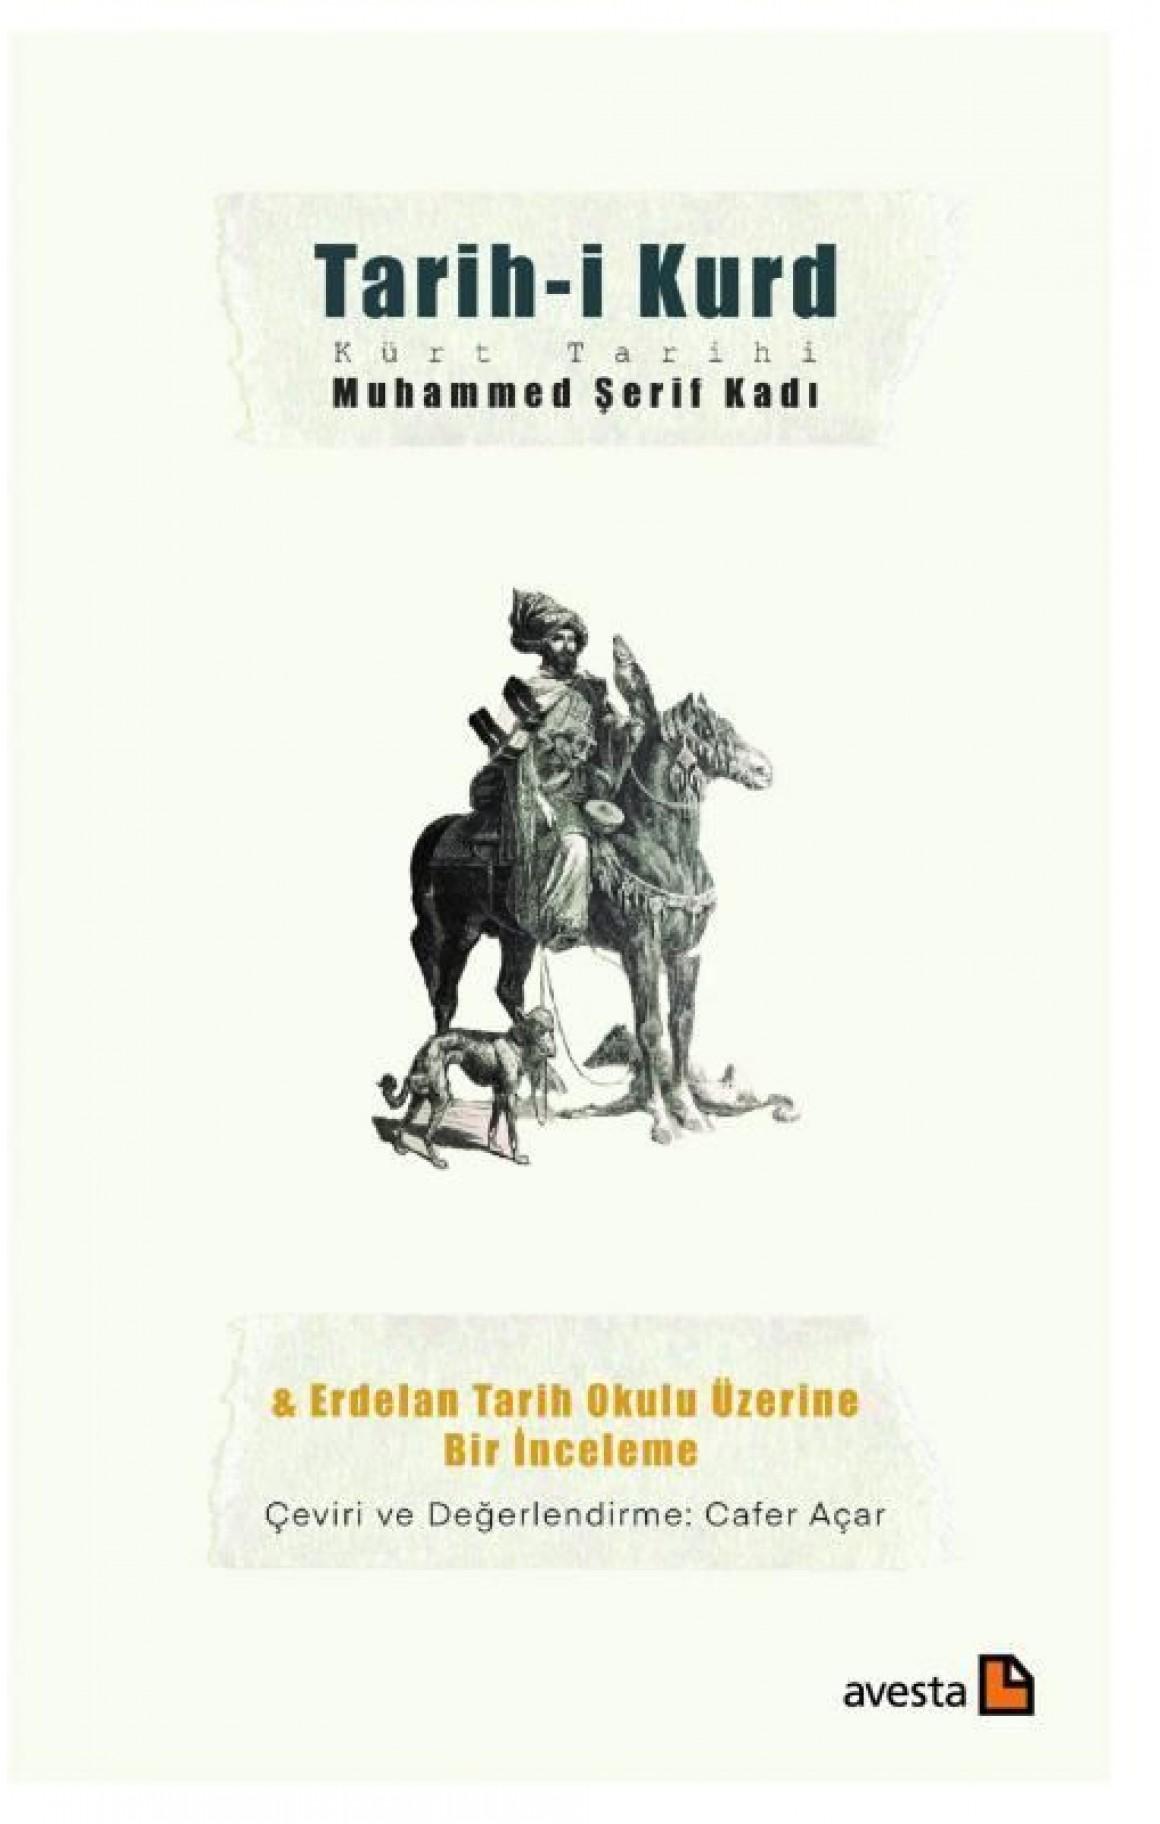 Tarih-i Kurd-Kürt Tarihi